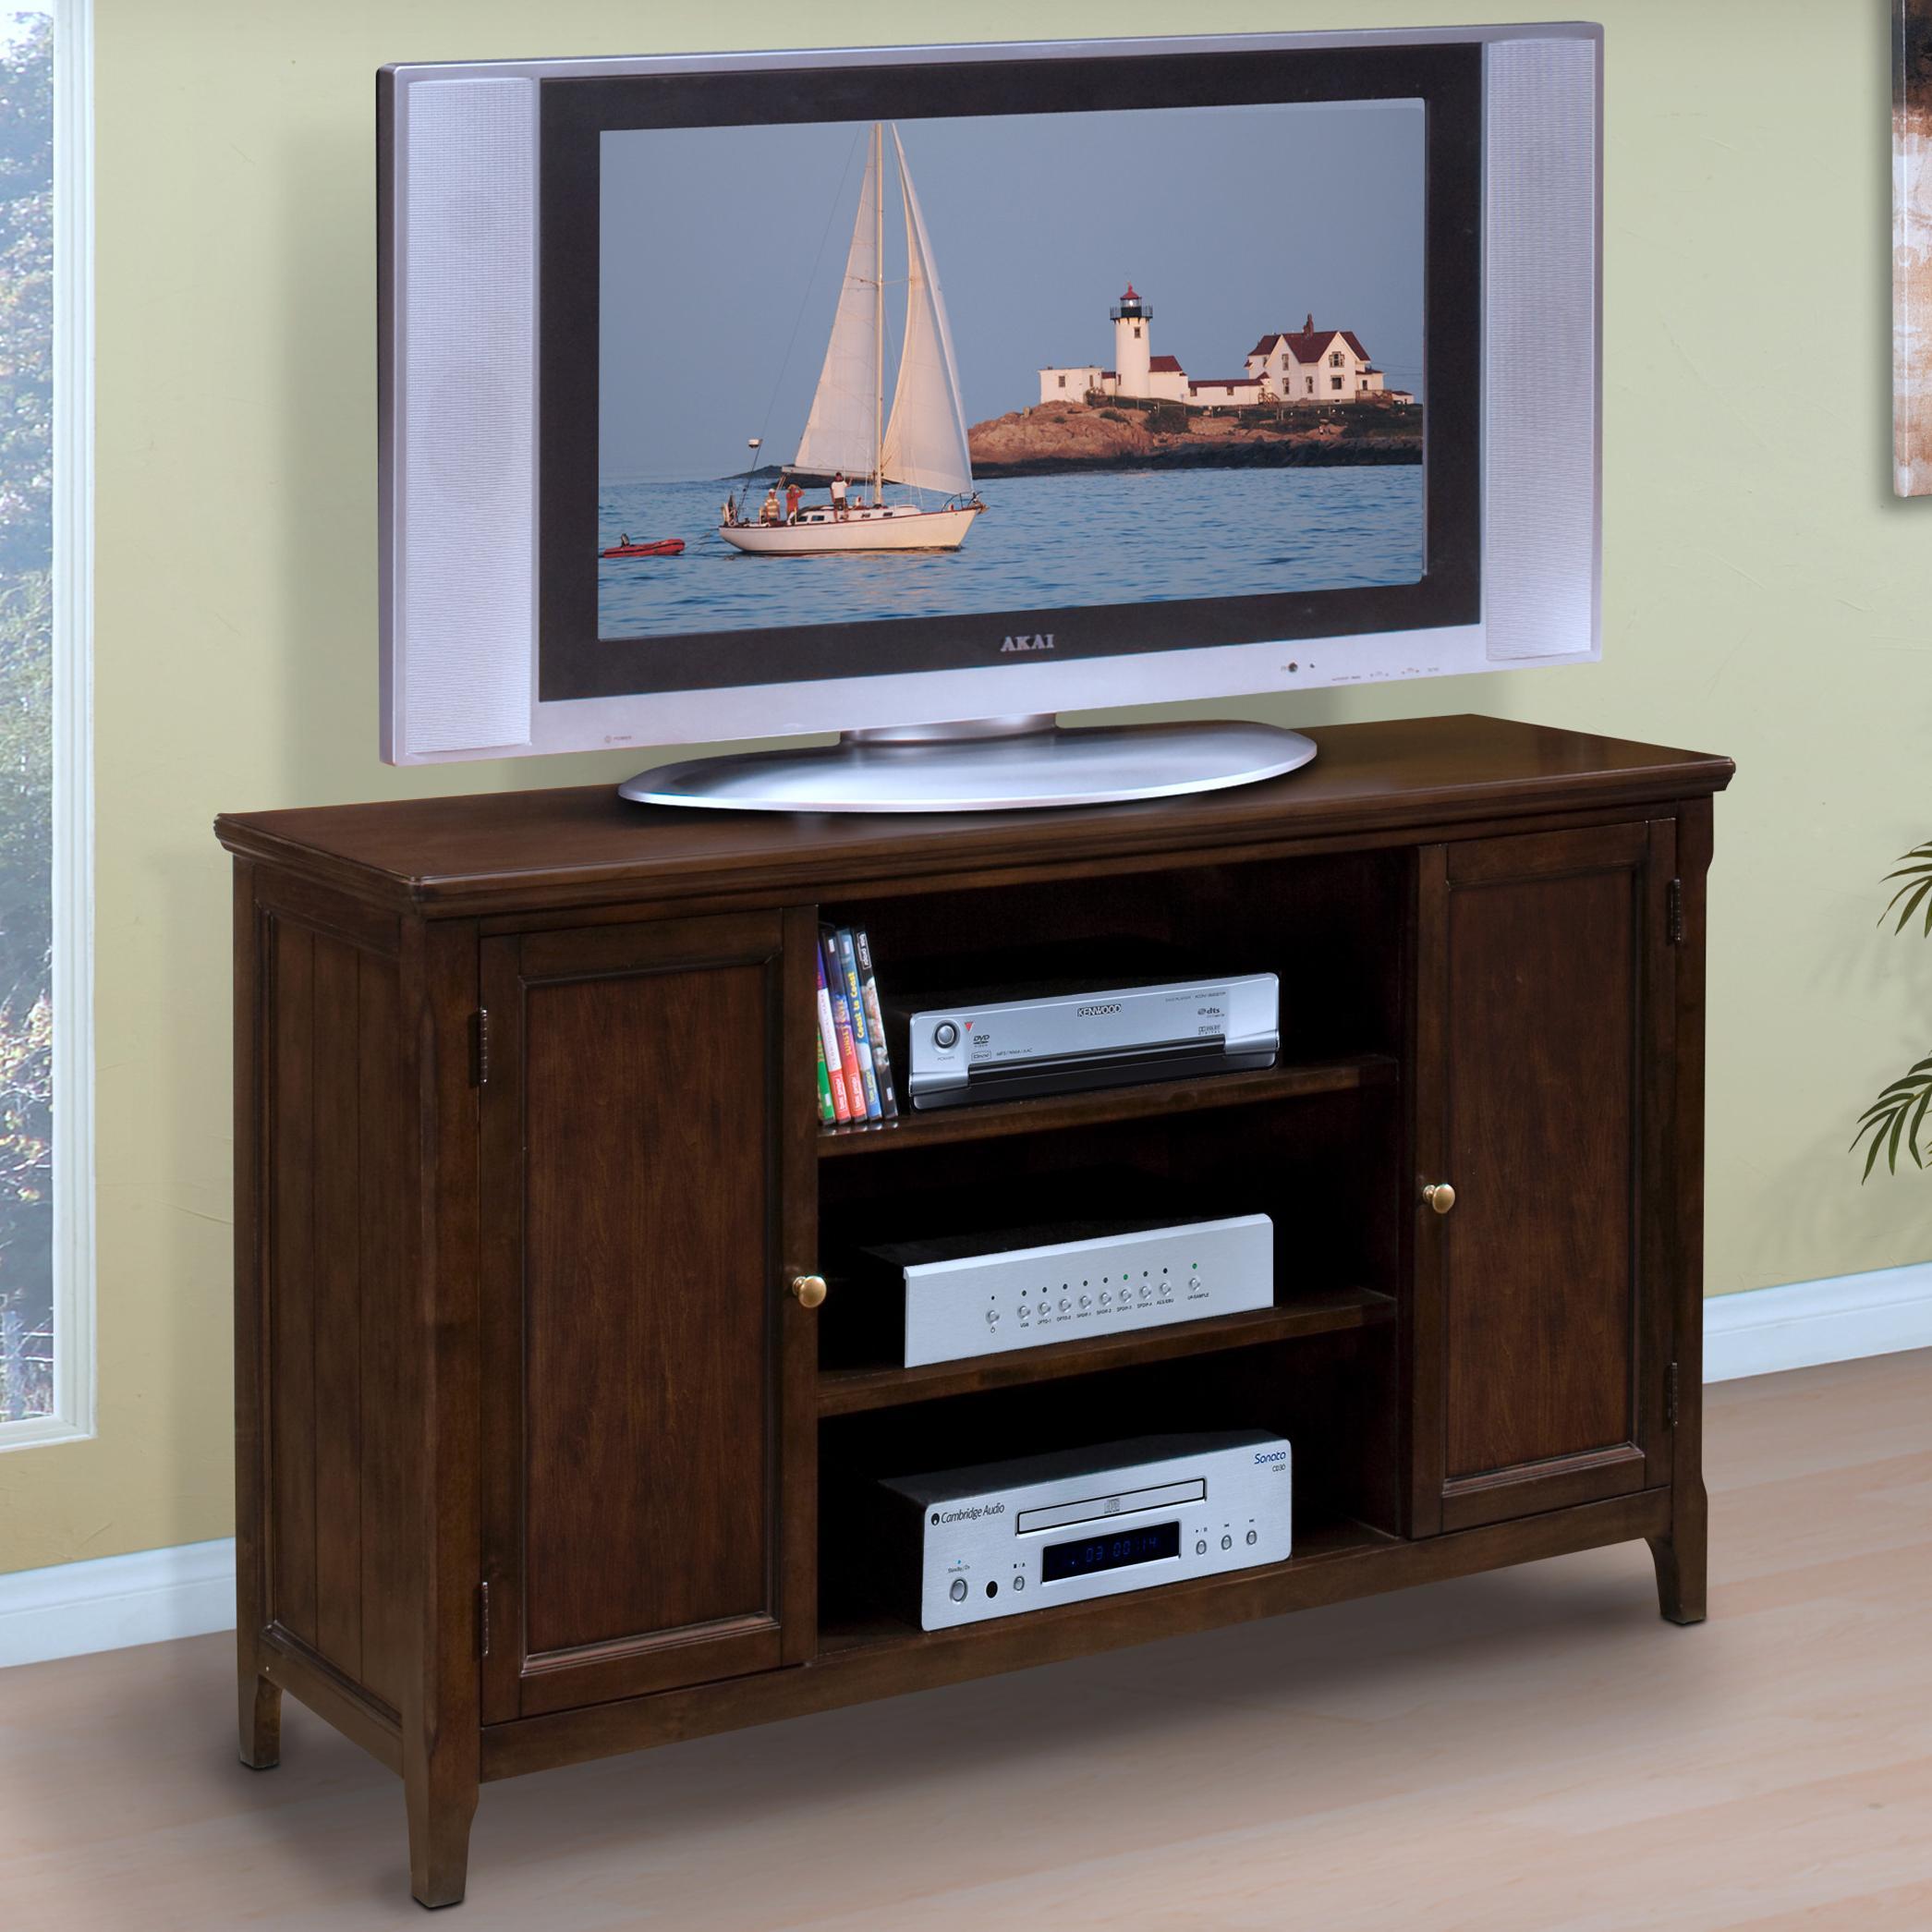 "Timber City 60"" TV Console at Lapeer Furniture & Mattress Center"